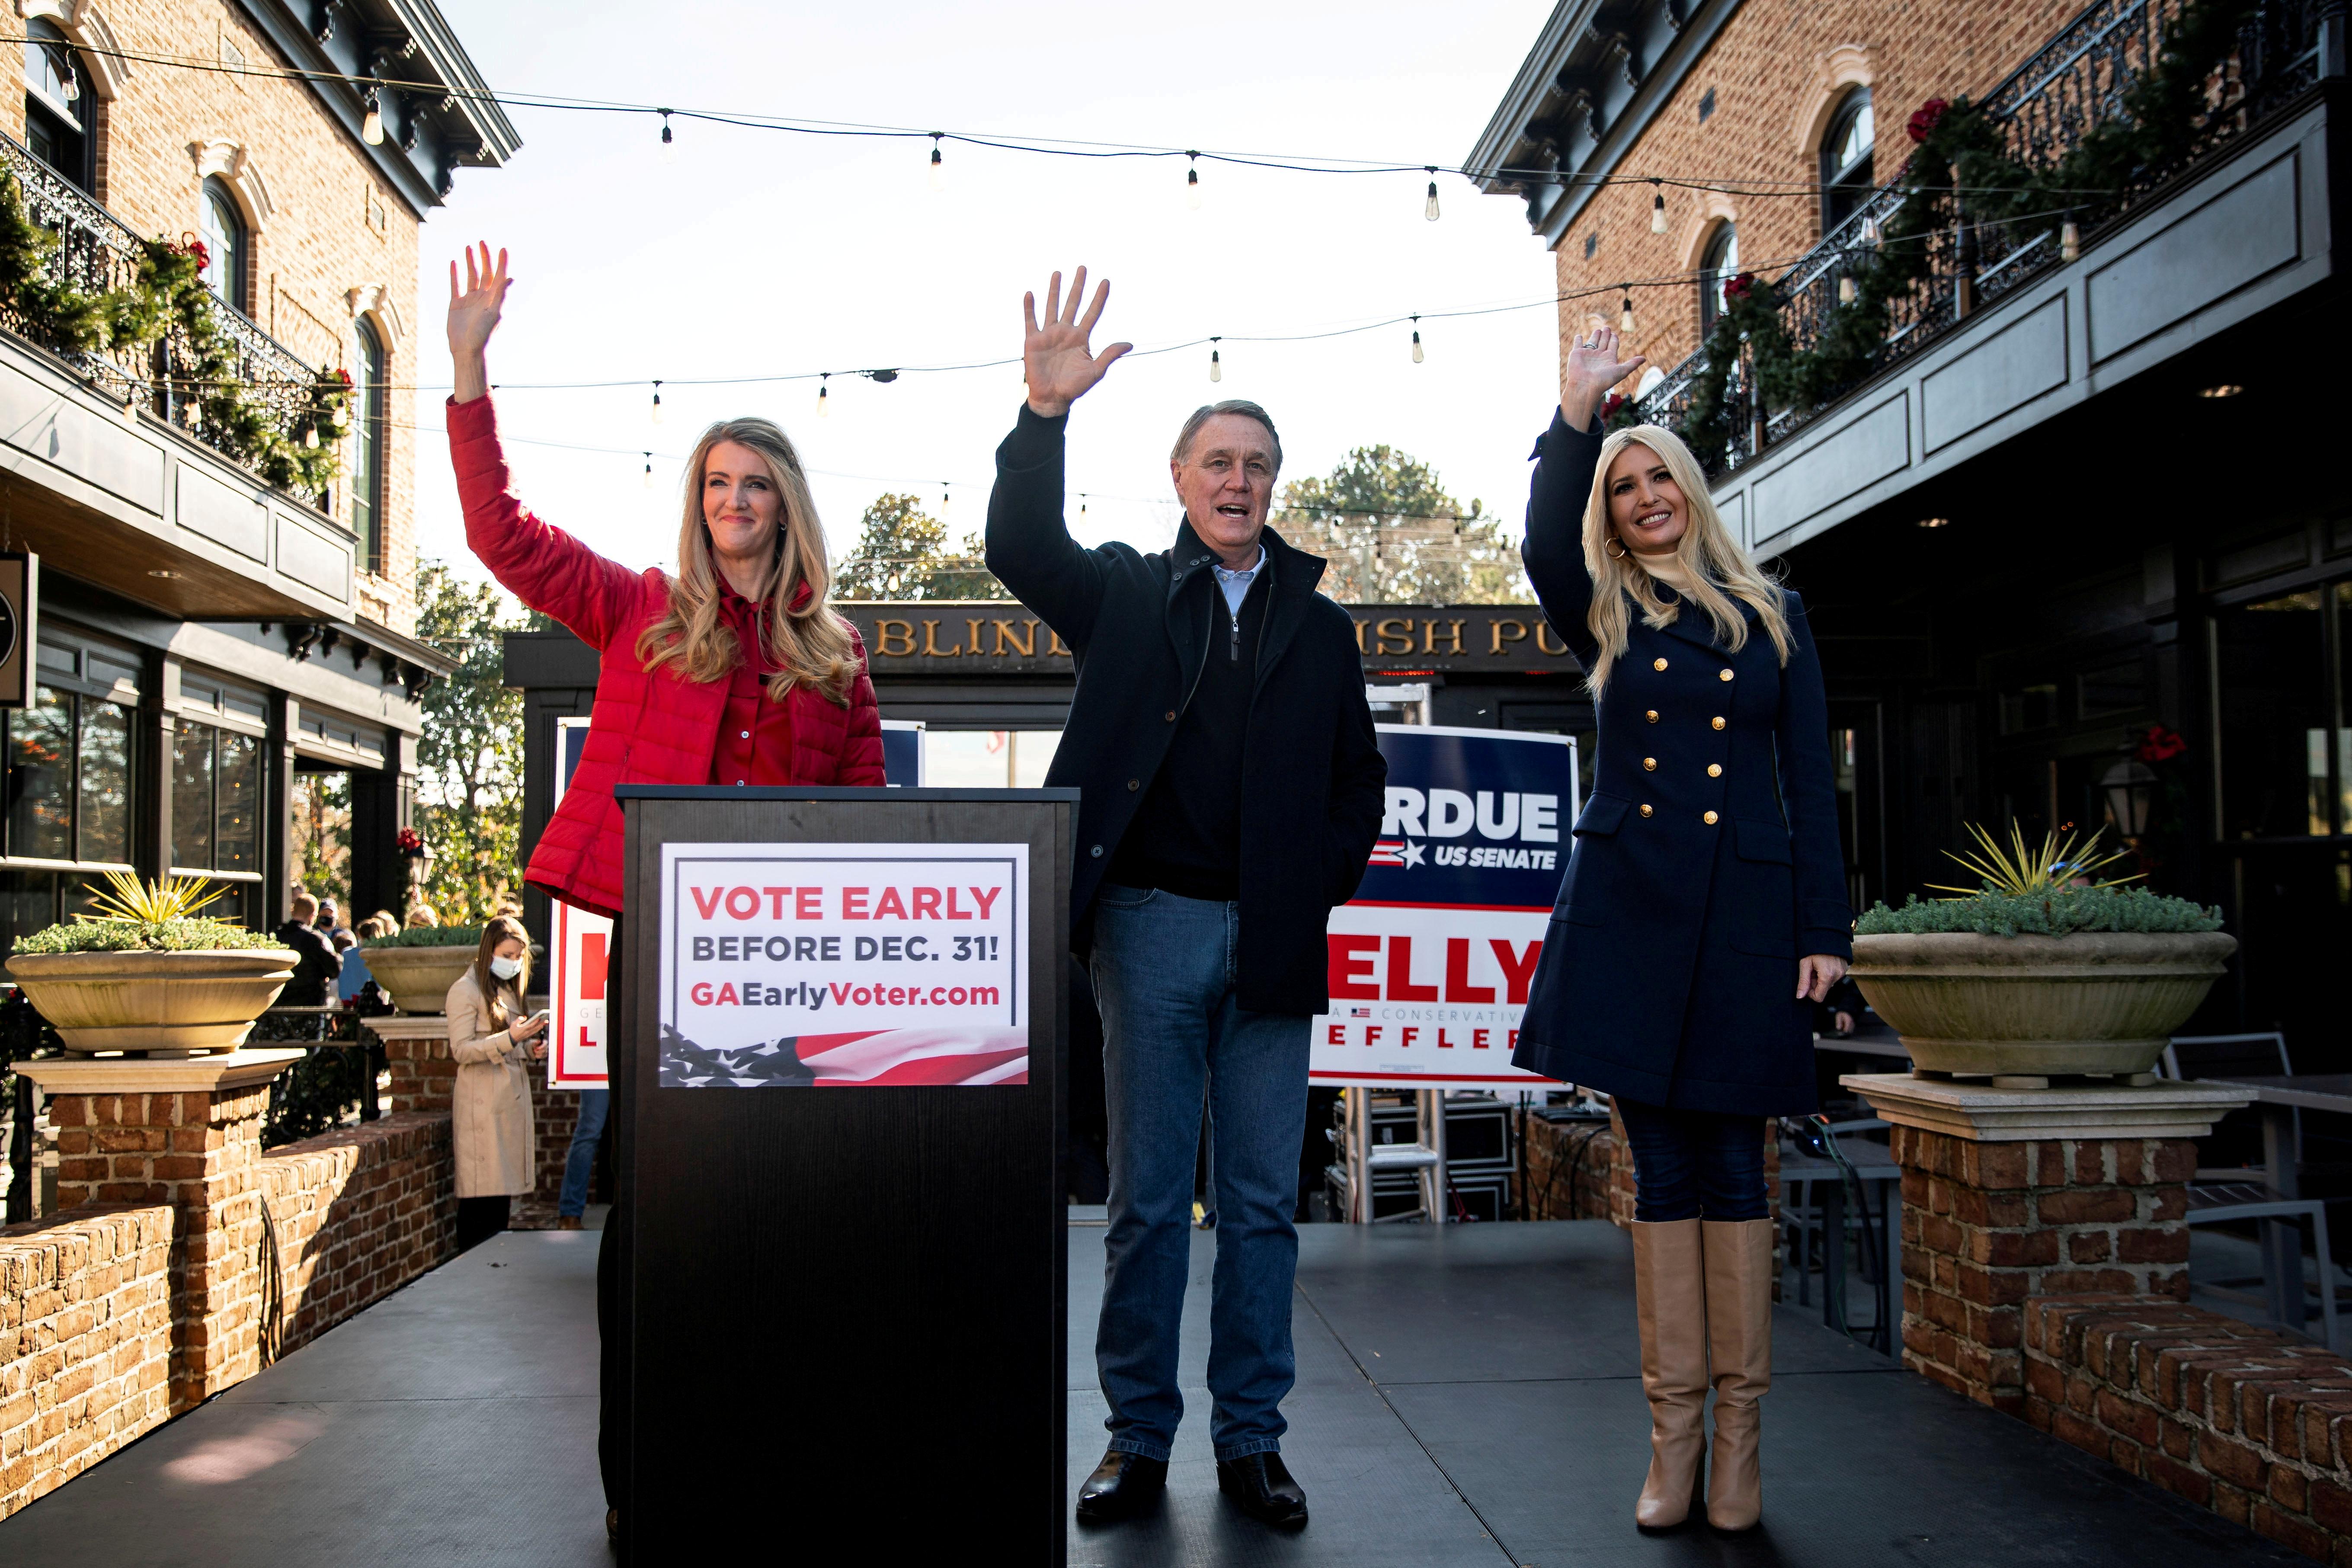 Senator Kelly Loeffler (R-GA), Senator David Perdue (R-GA), and White House senior adviser Ivanka Trump wave during a campaign event at the Olde Blind Dog Irish Pub, in Milton, Georgia, U.S., December 21, 2020.REUTERS/Al Drago